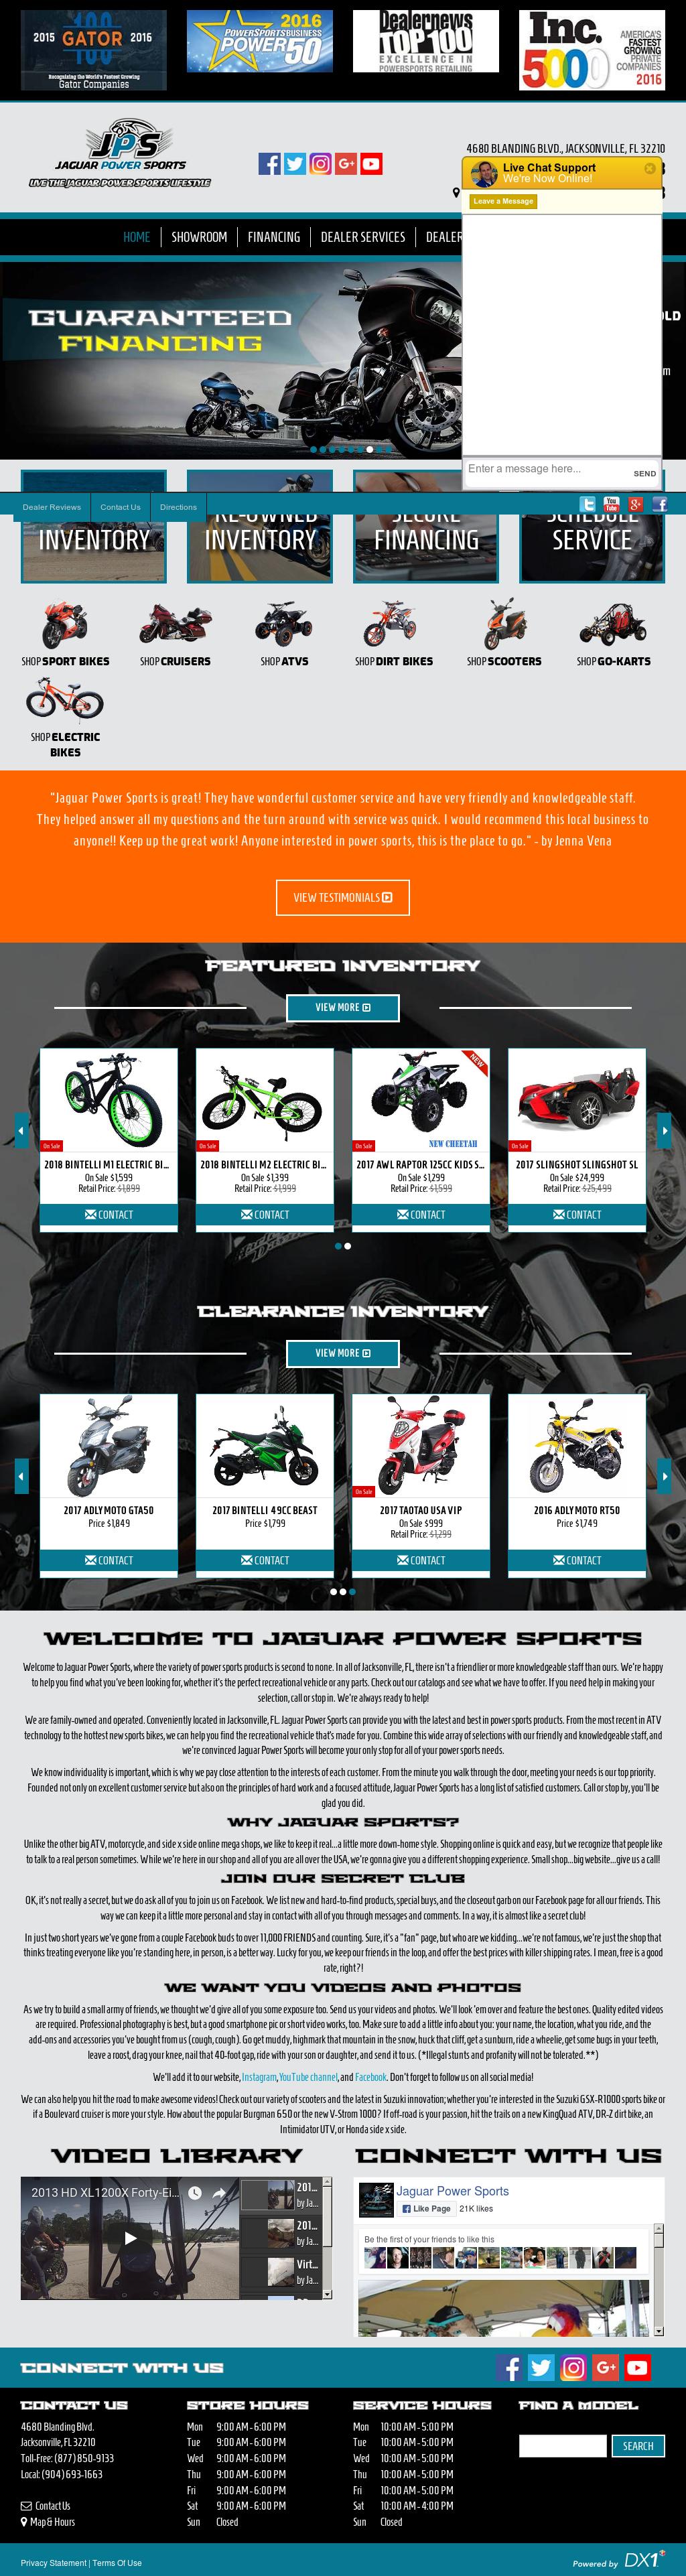 Jaguar Power Sports Website History